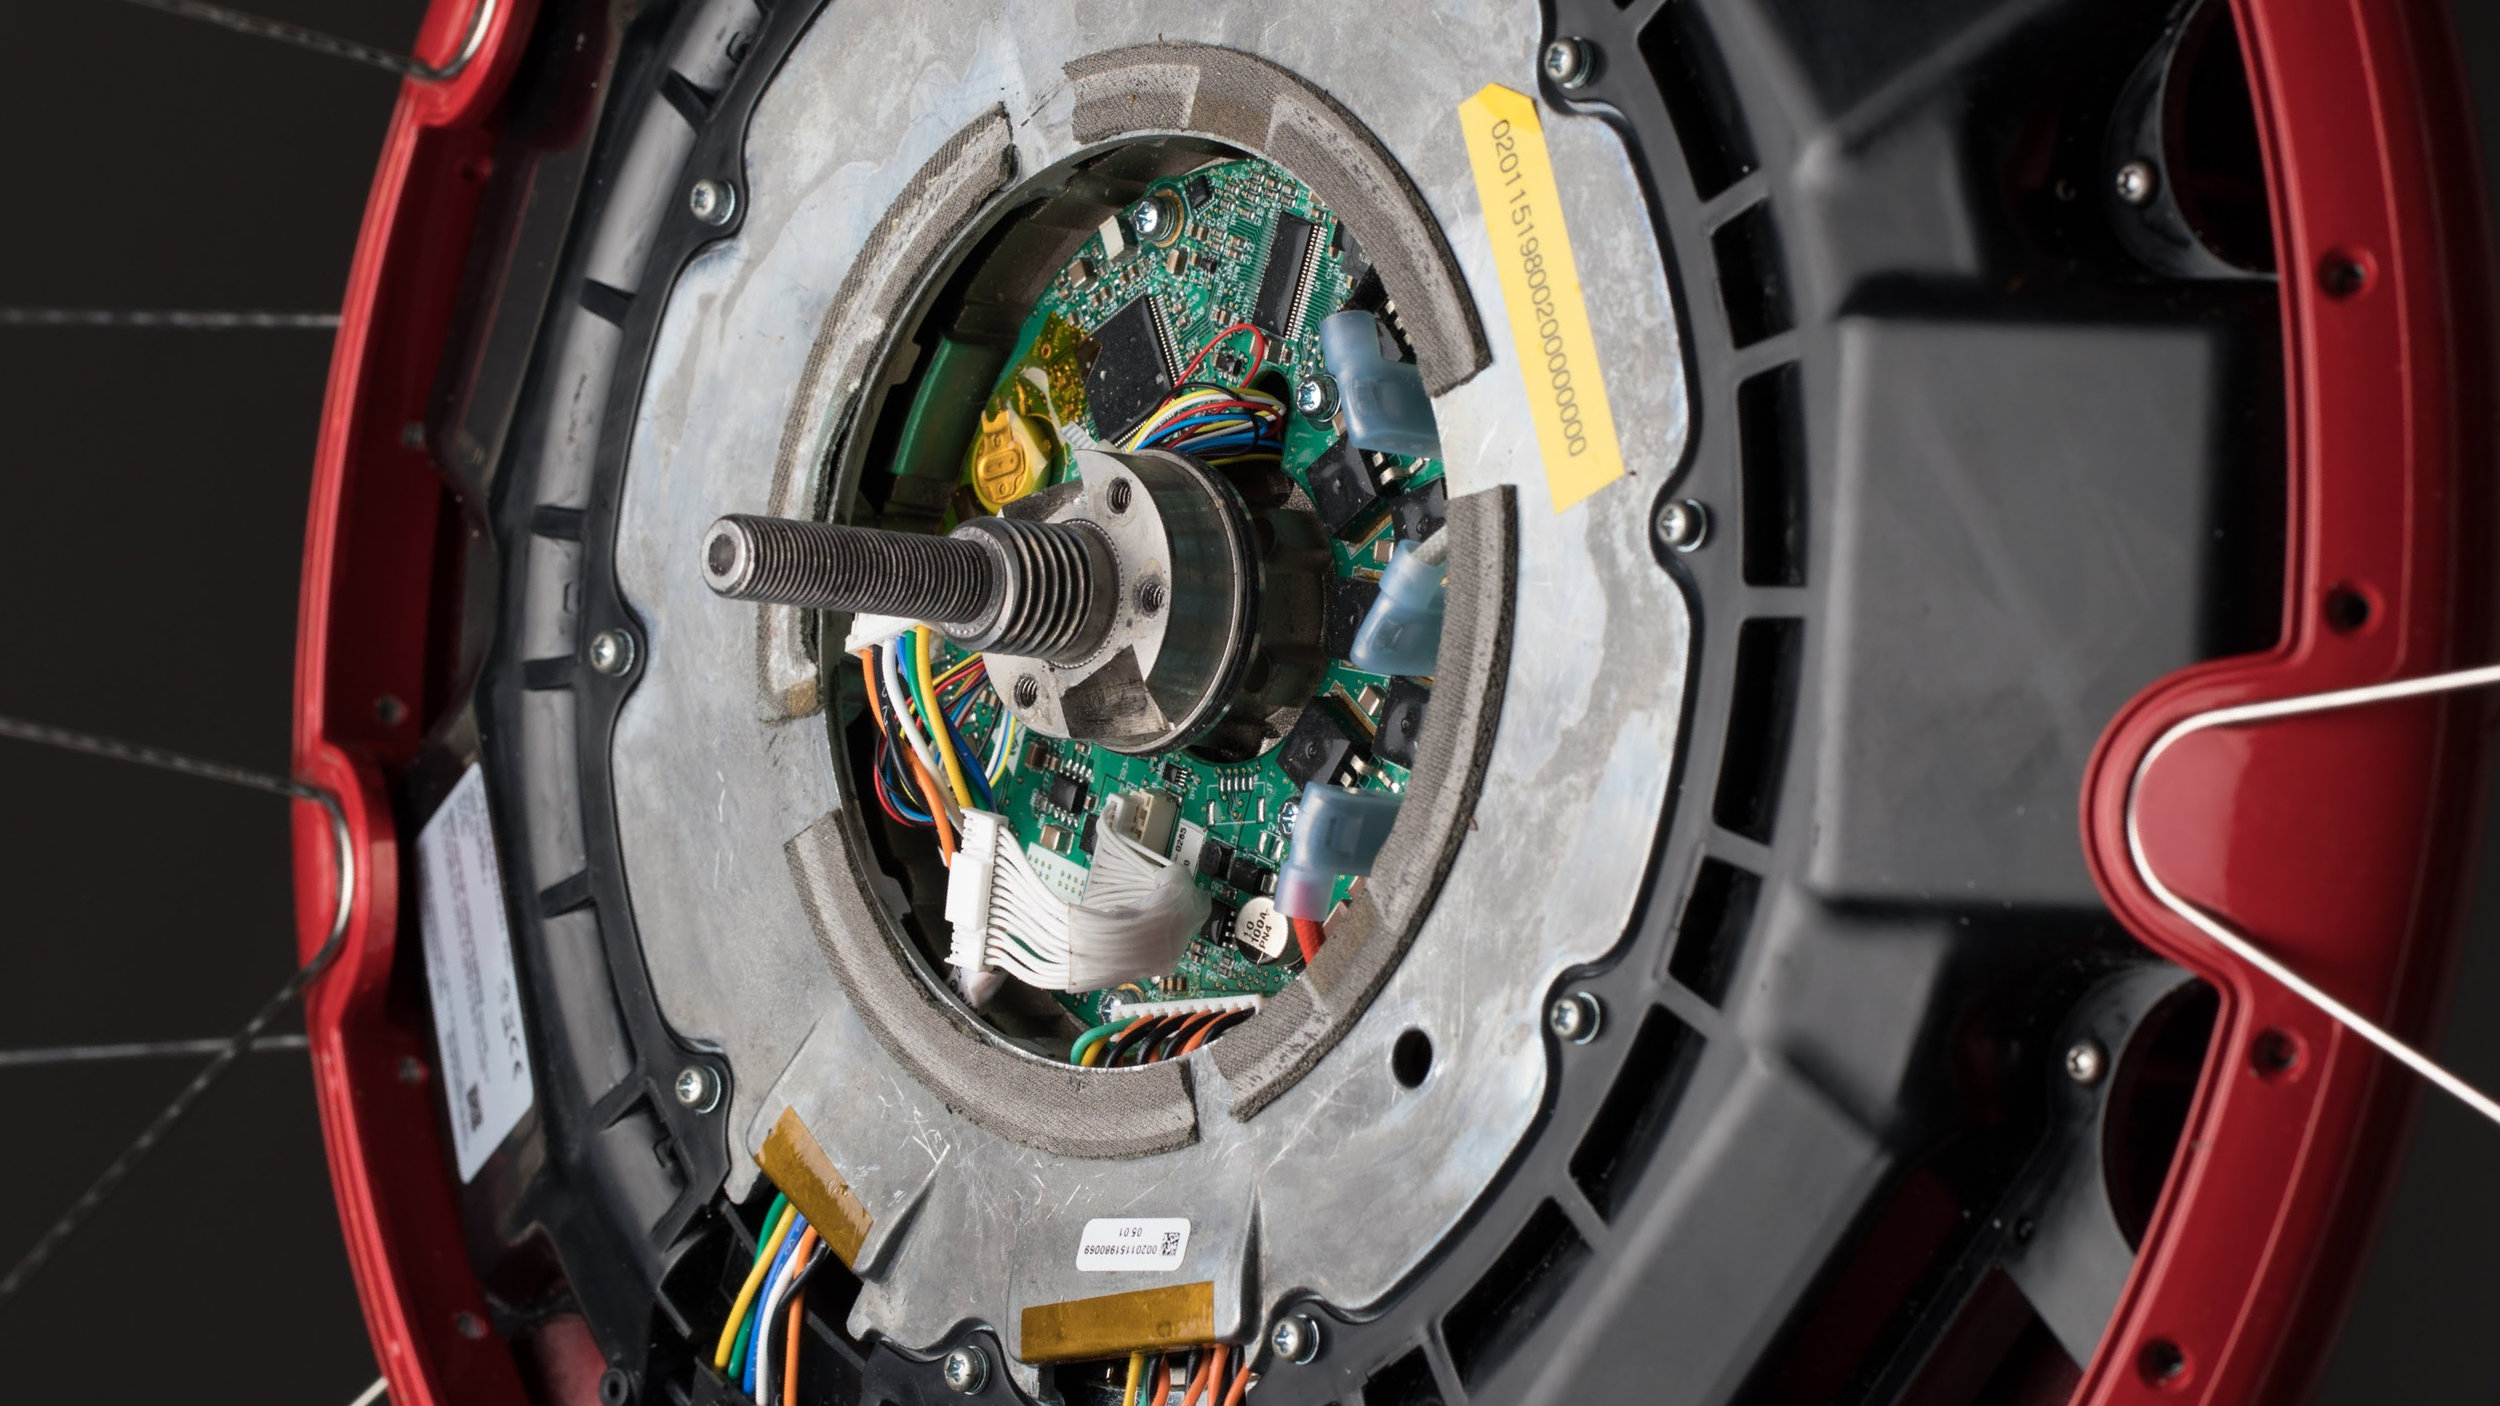 copenhagen-wheel-advanced-self-diagnostic.jpg